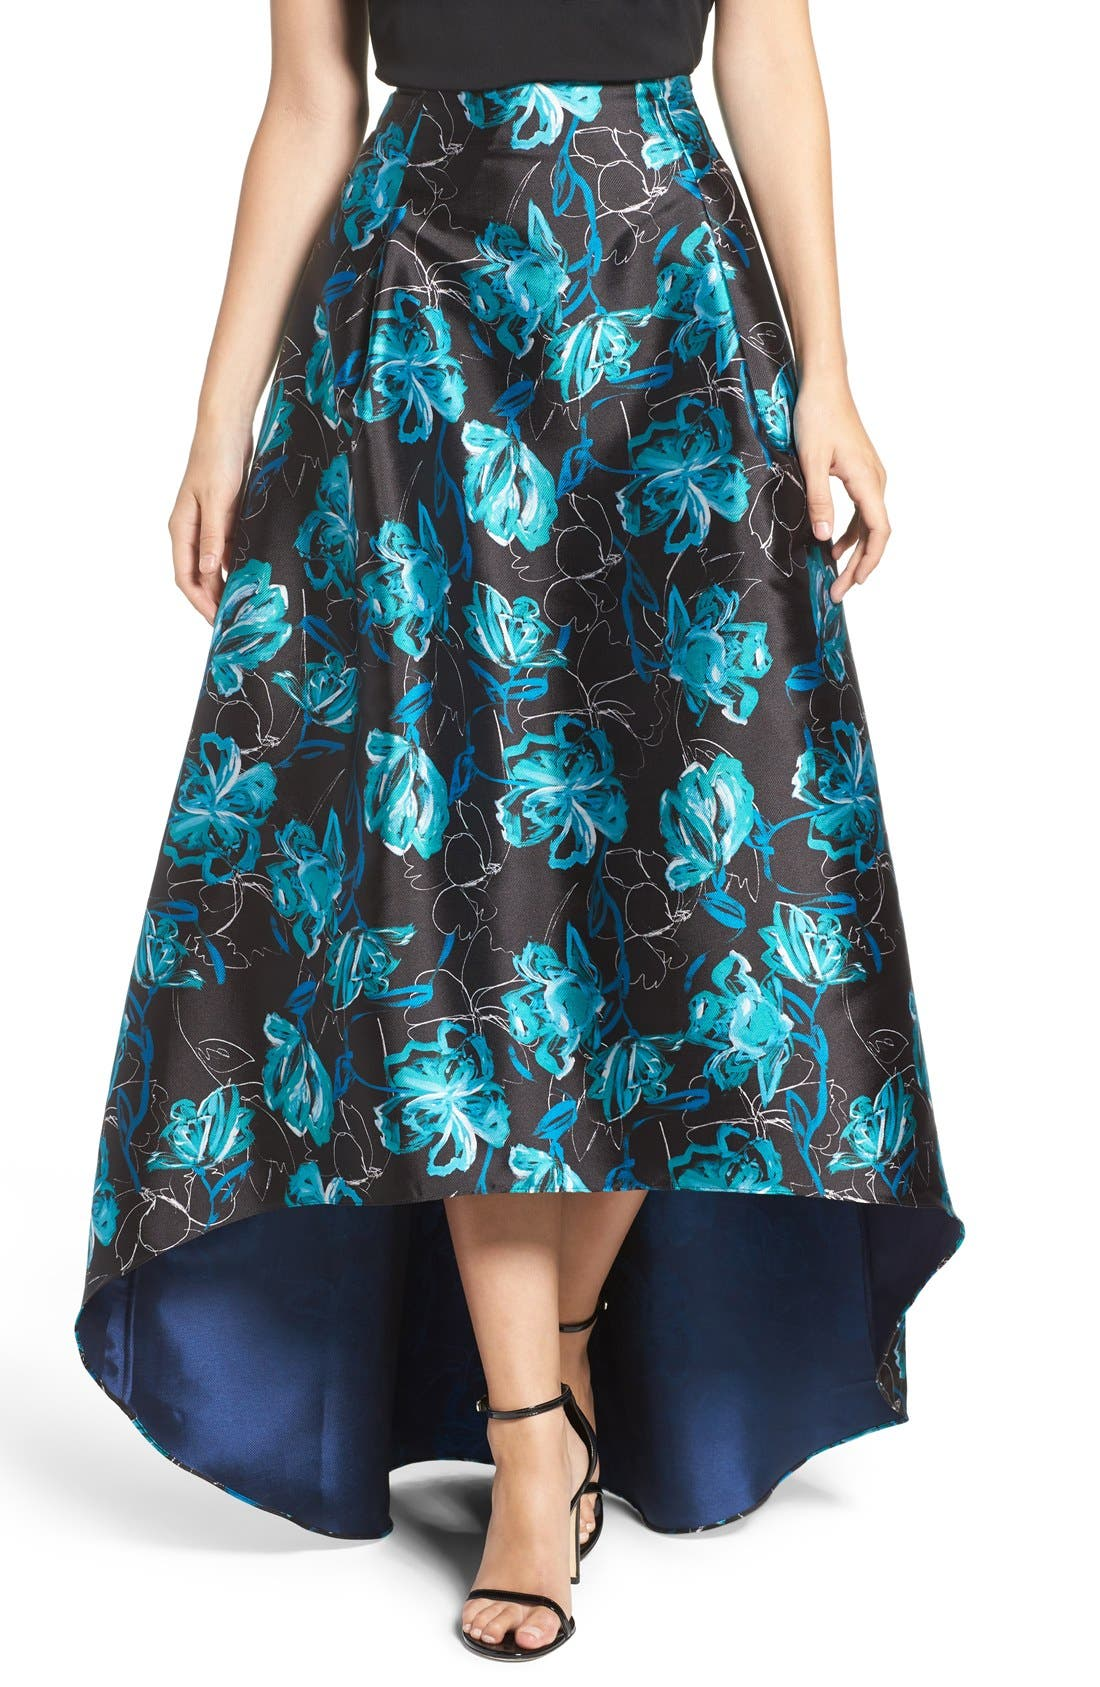 Main Image - Sachin & Babi Noir 'Avalon' High/Low Jacquard Ball Skirt